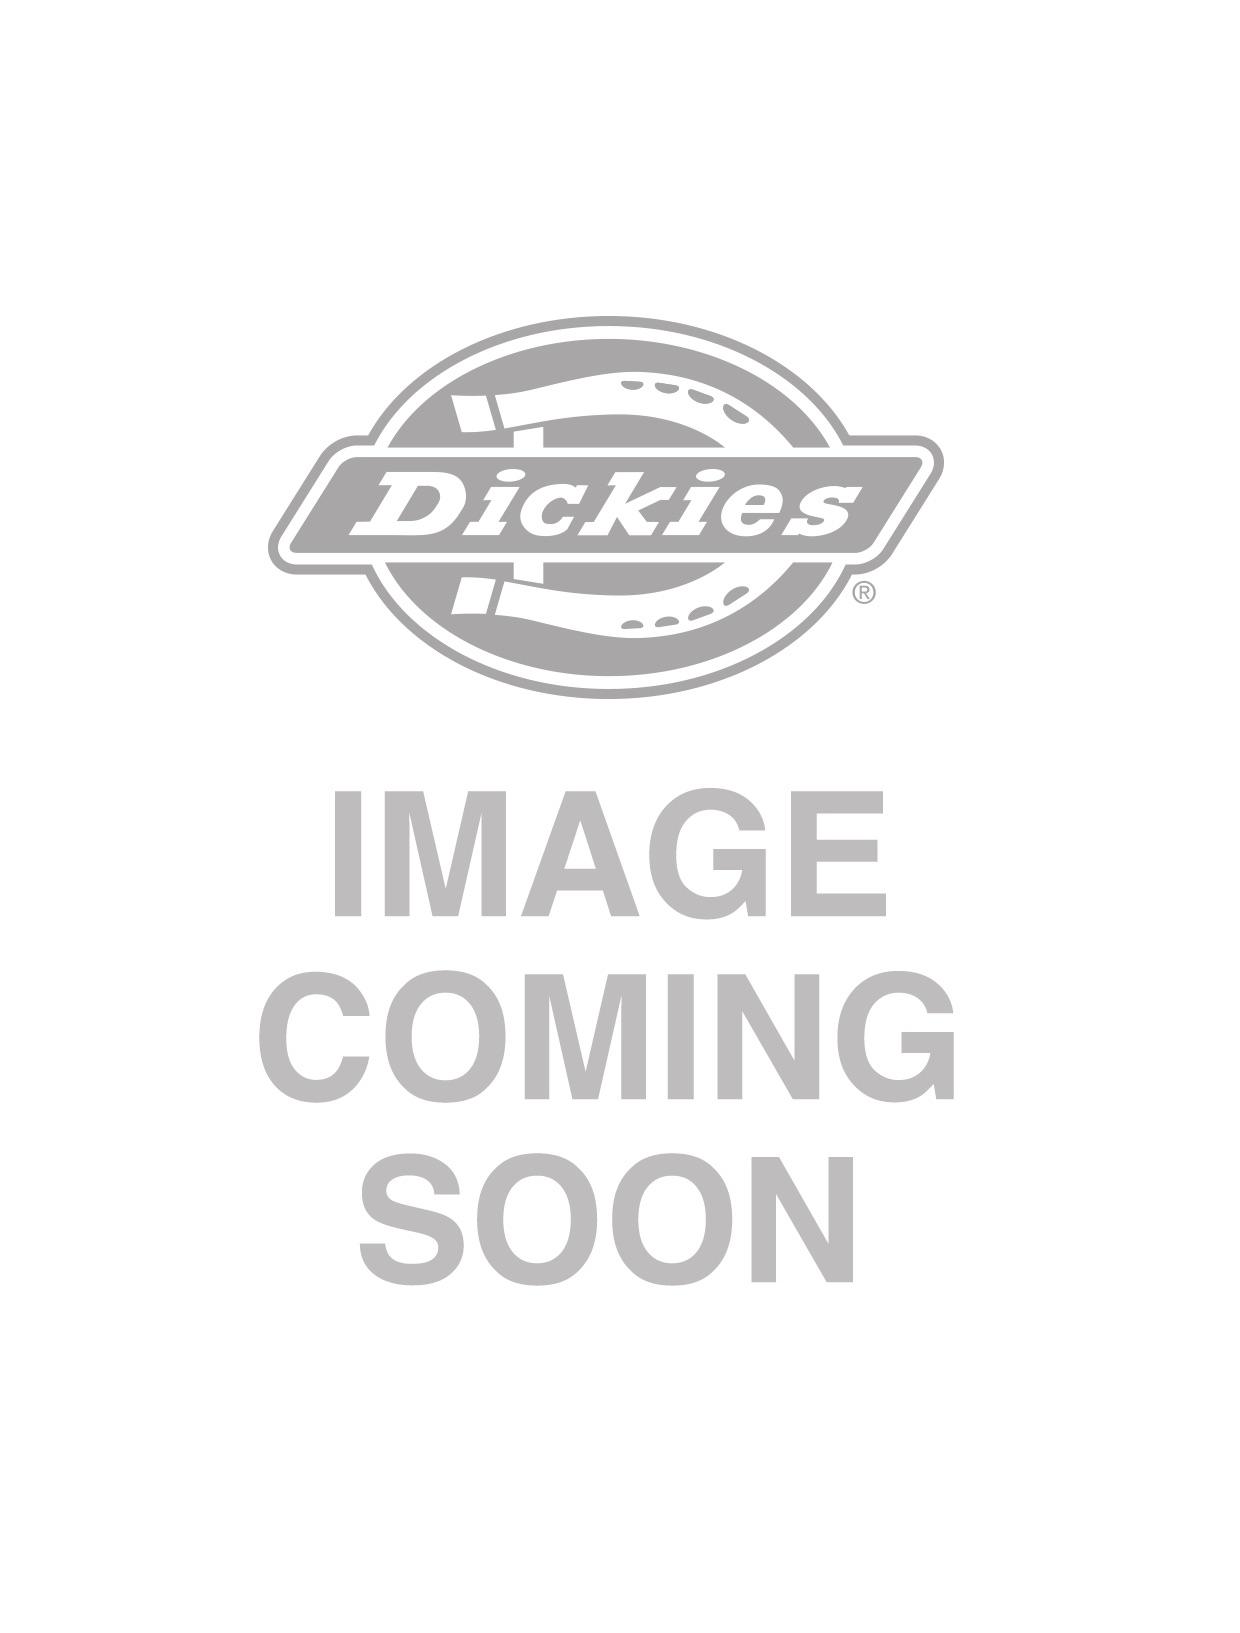 Dickies Brewerton Coach Jacket